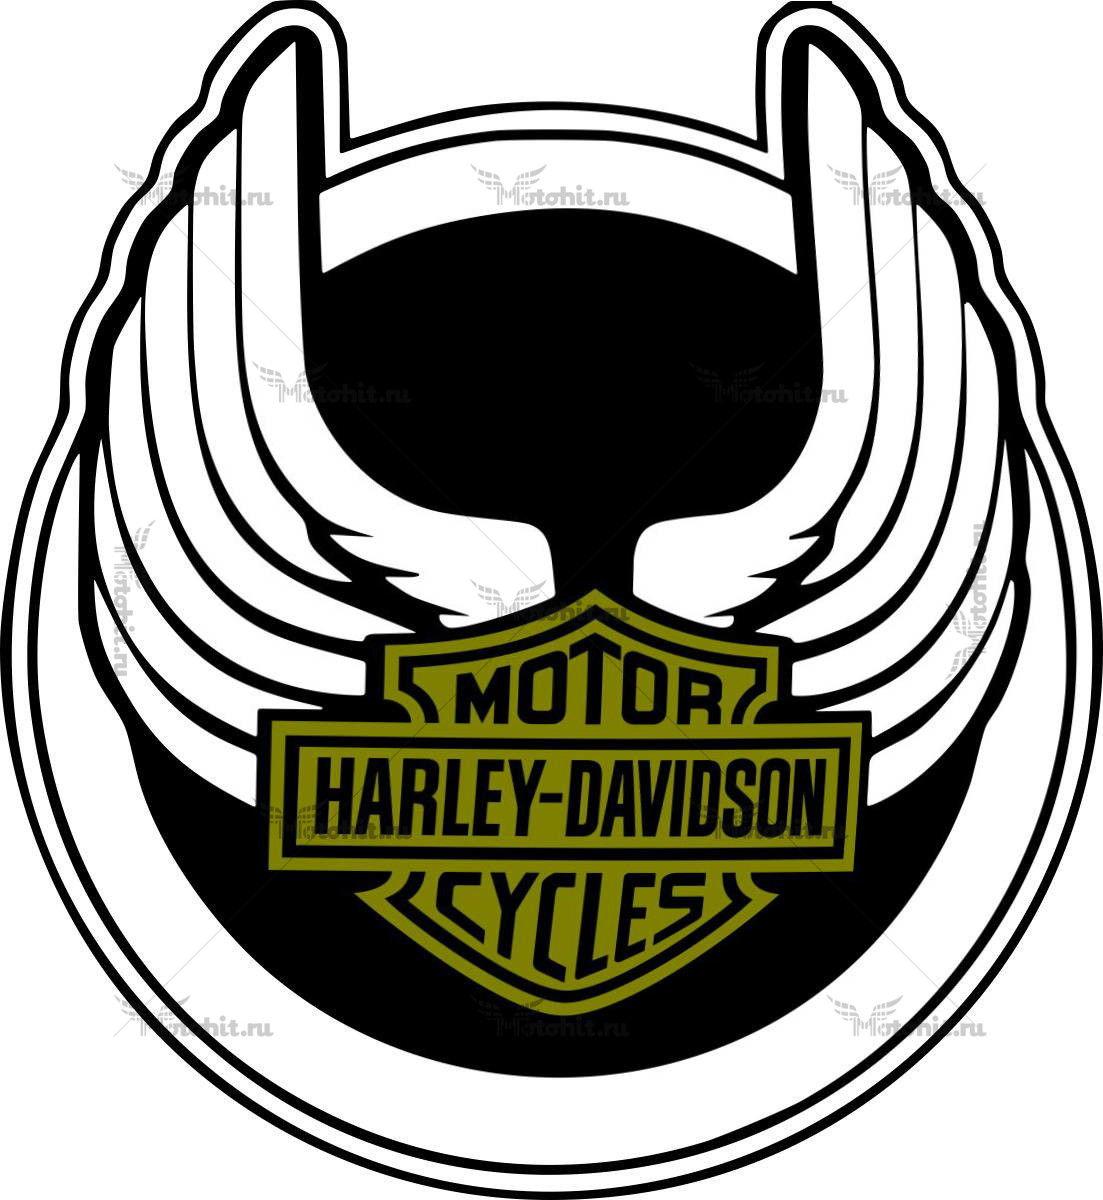 Наклейка HARLEY DAVIDSON 22-CIRCLE